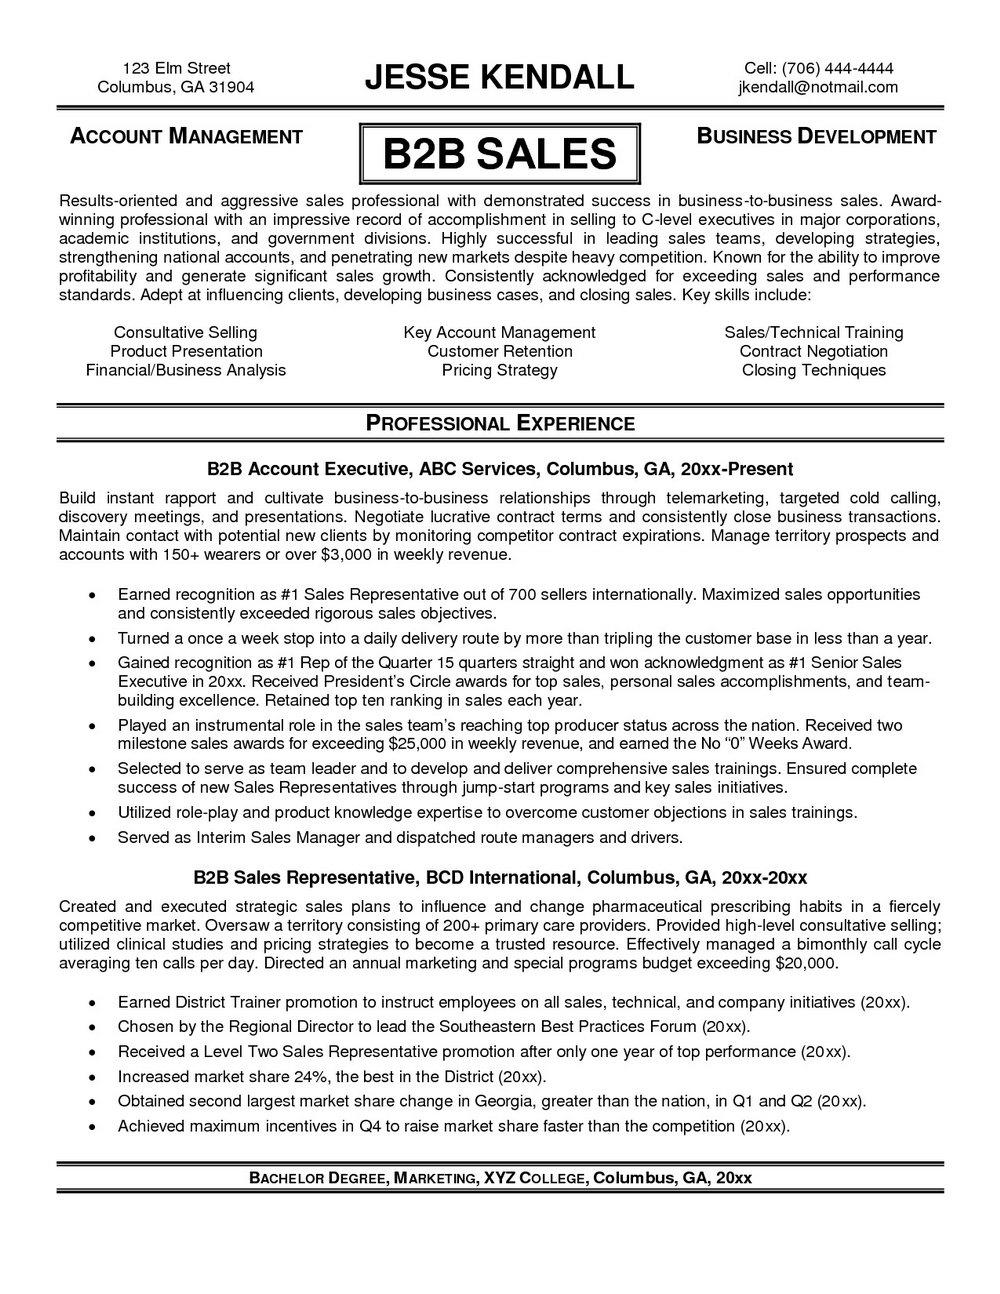 Resume Templates For Salesman